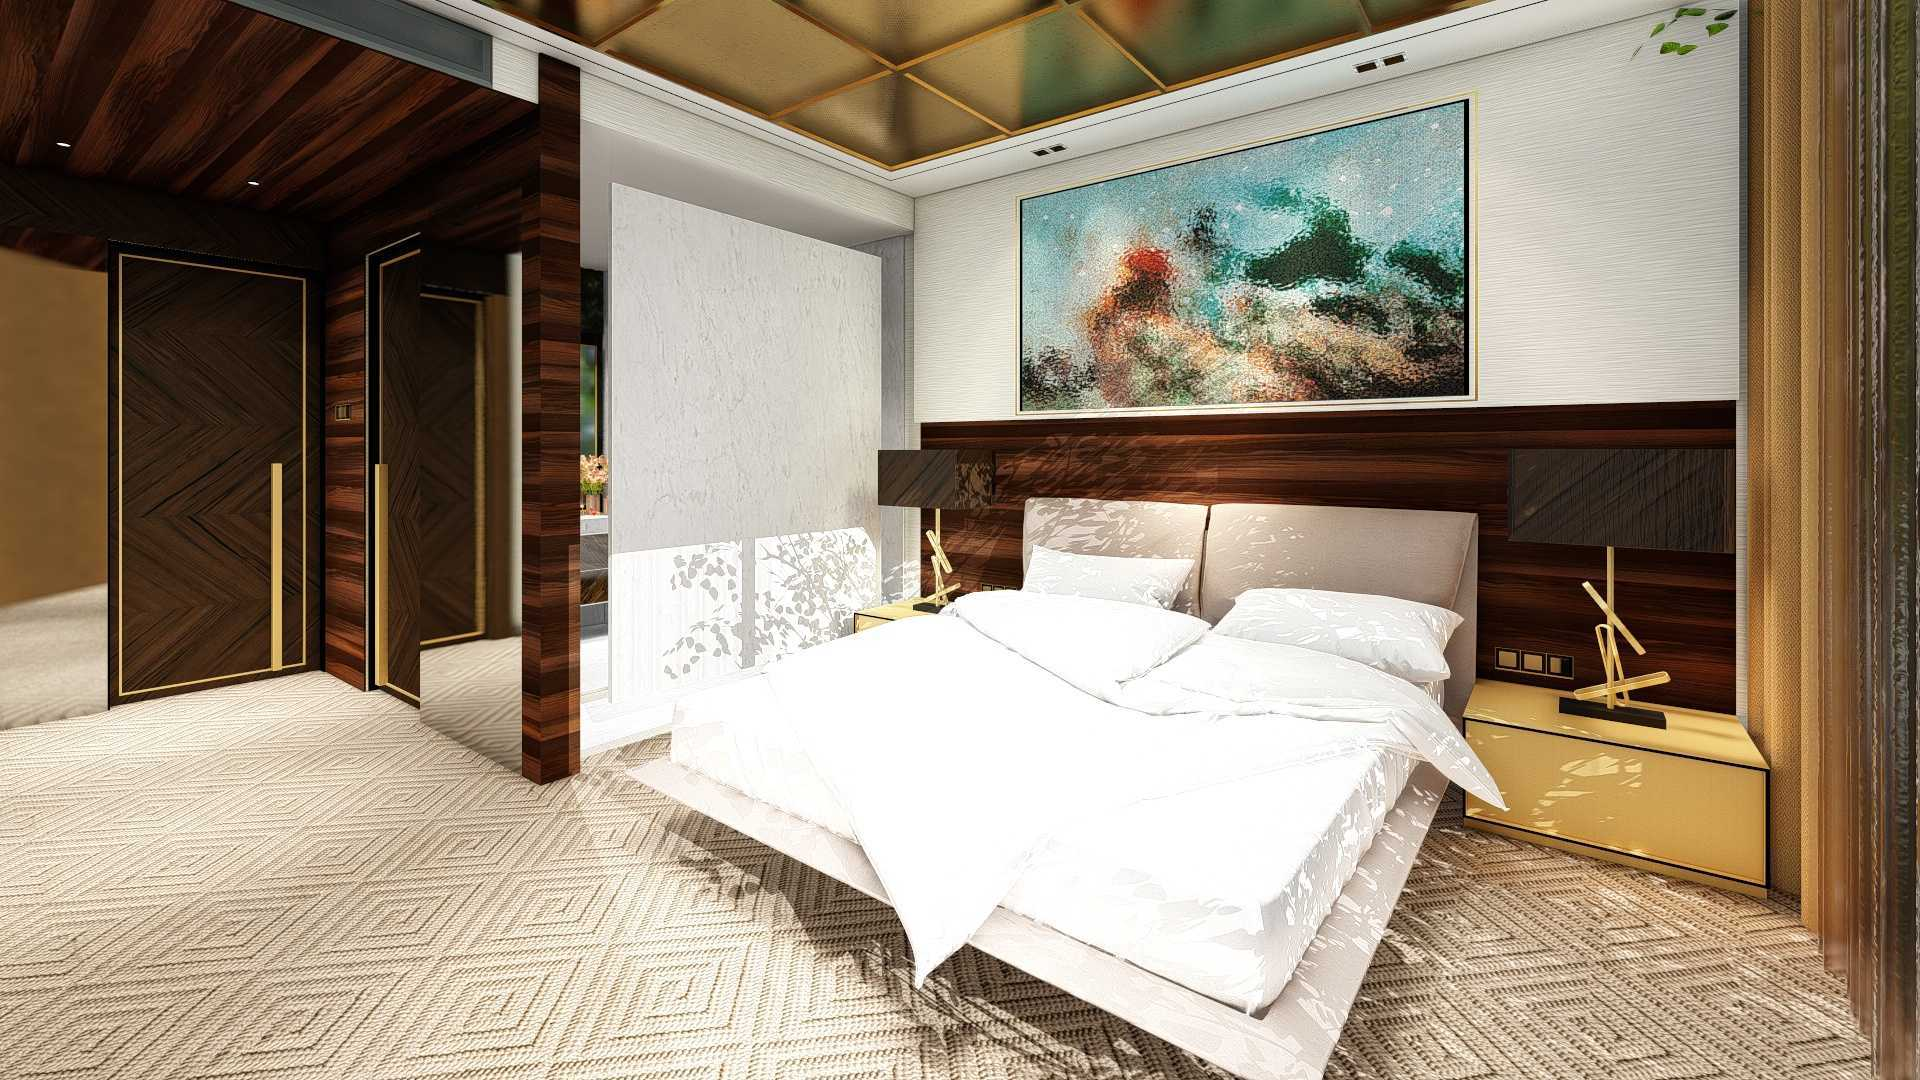 Samitrayasa Design Luxury Hotel Room Alternative 1 Jl. Kemang Raya, Bangka, Mampang Prpt., Kota Jakarta Selatan, Daerah Khusus Ibukota Jakarta, Indonesia  201 Modern  32659